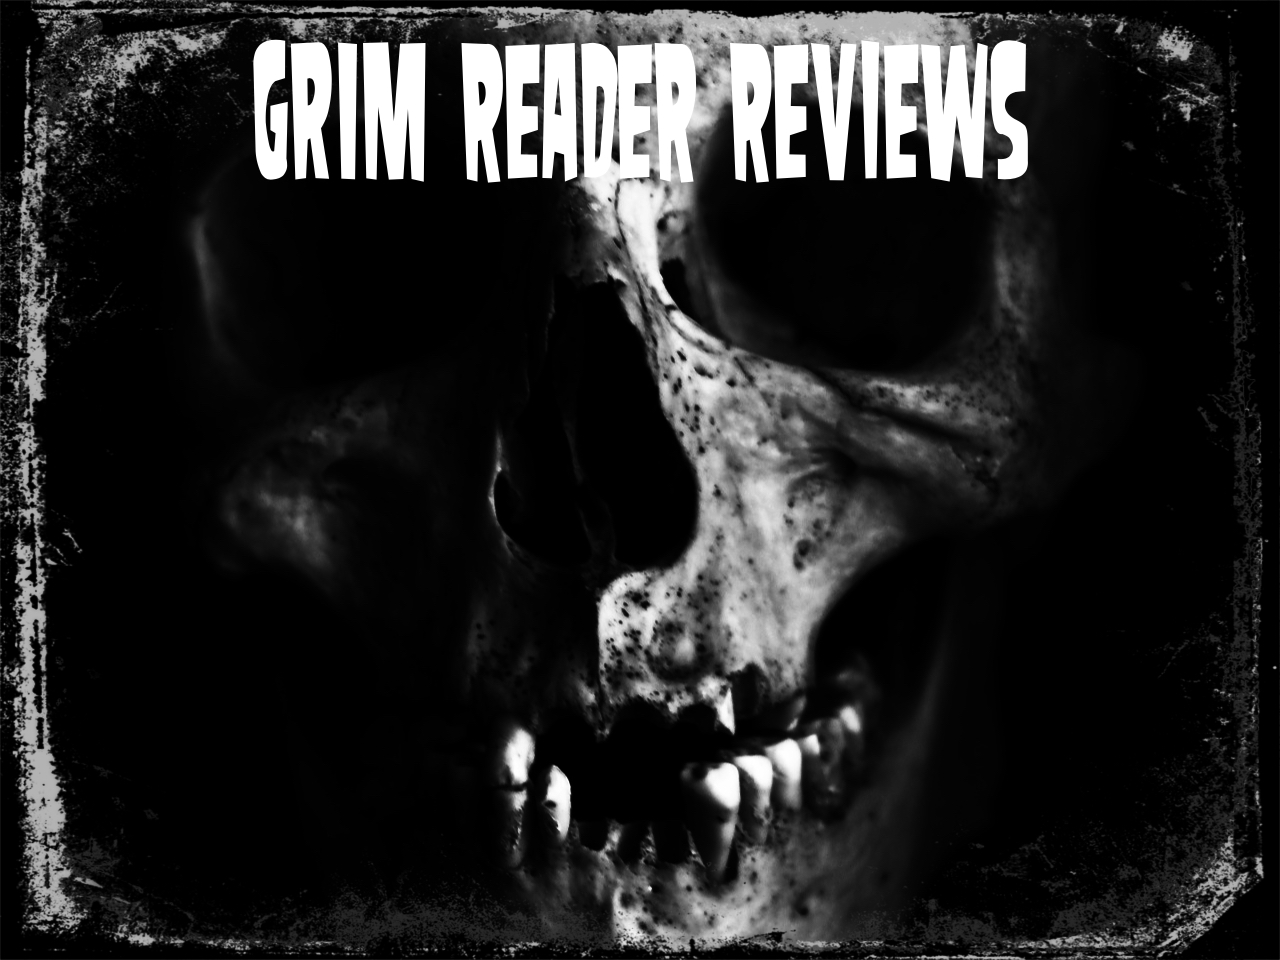 Grim Reader Reviews